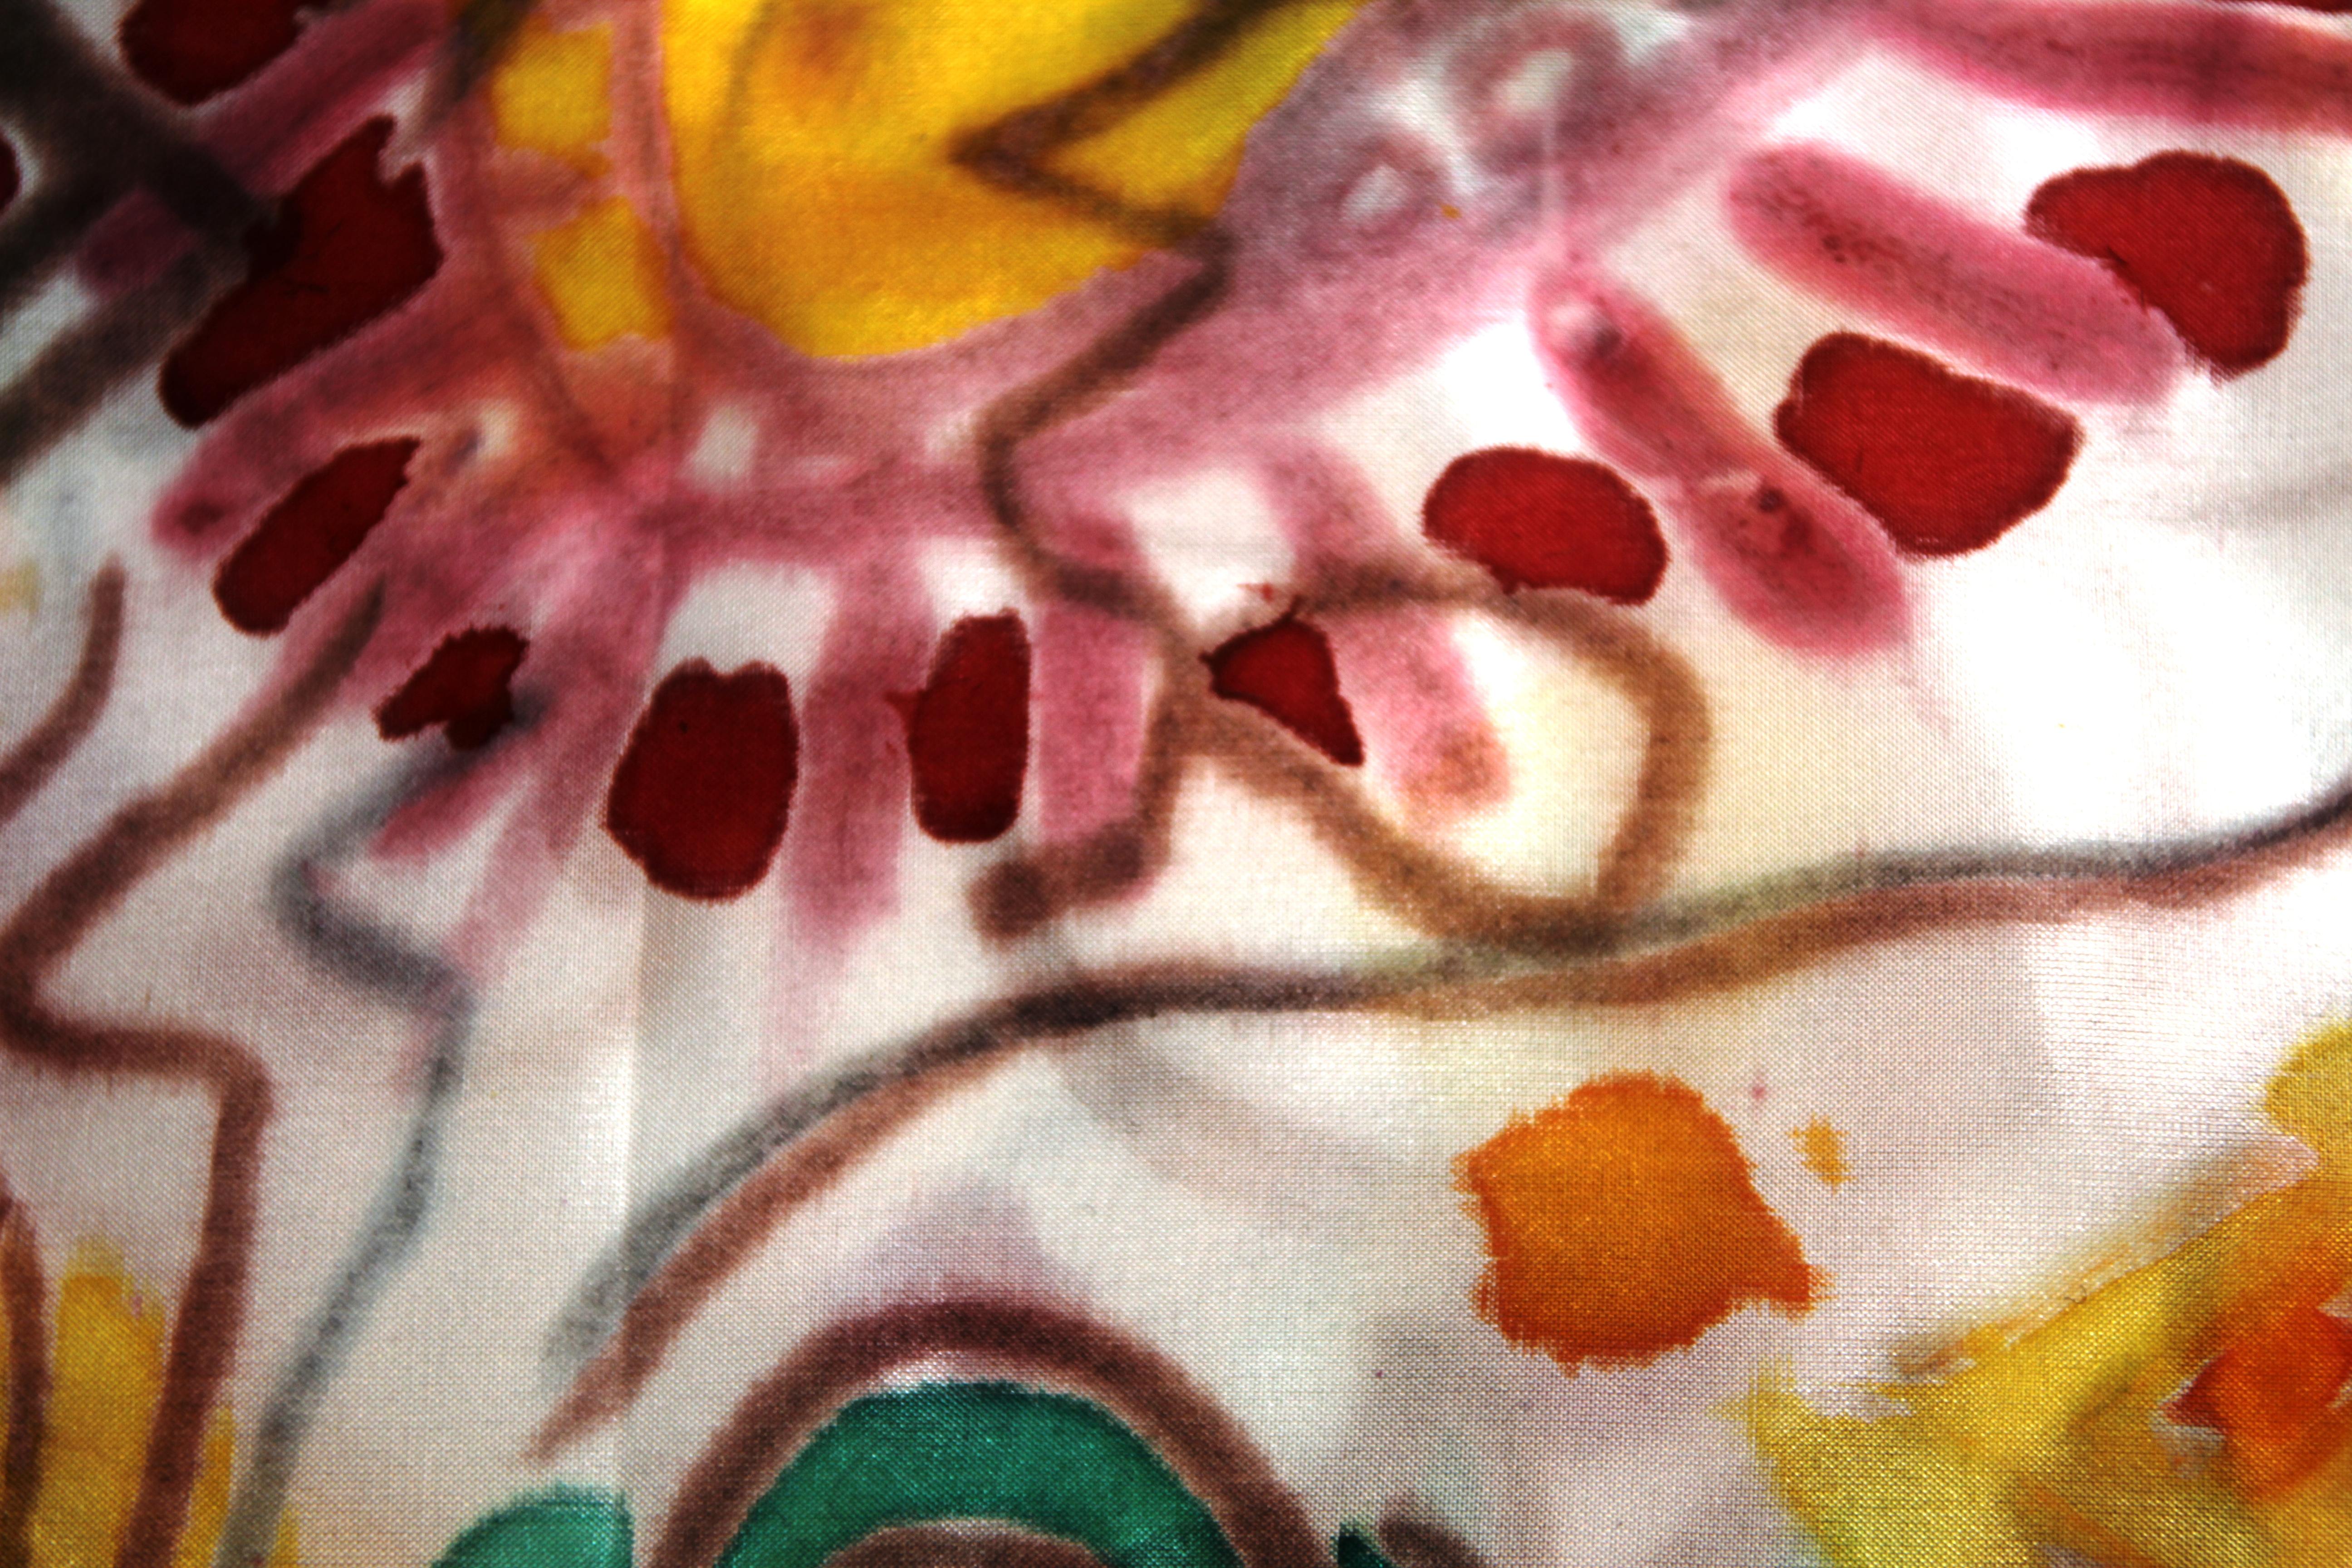 Coloruful asisn textile design